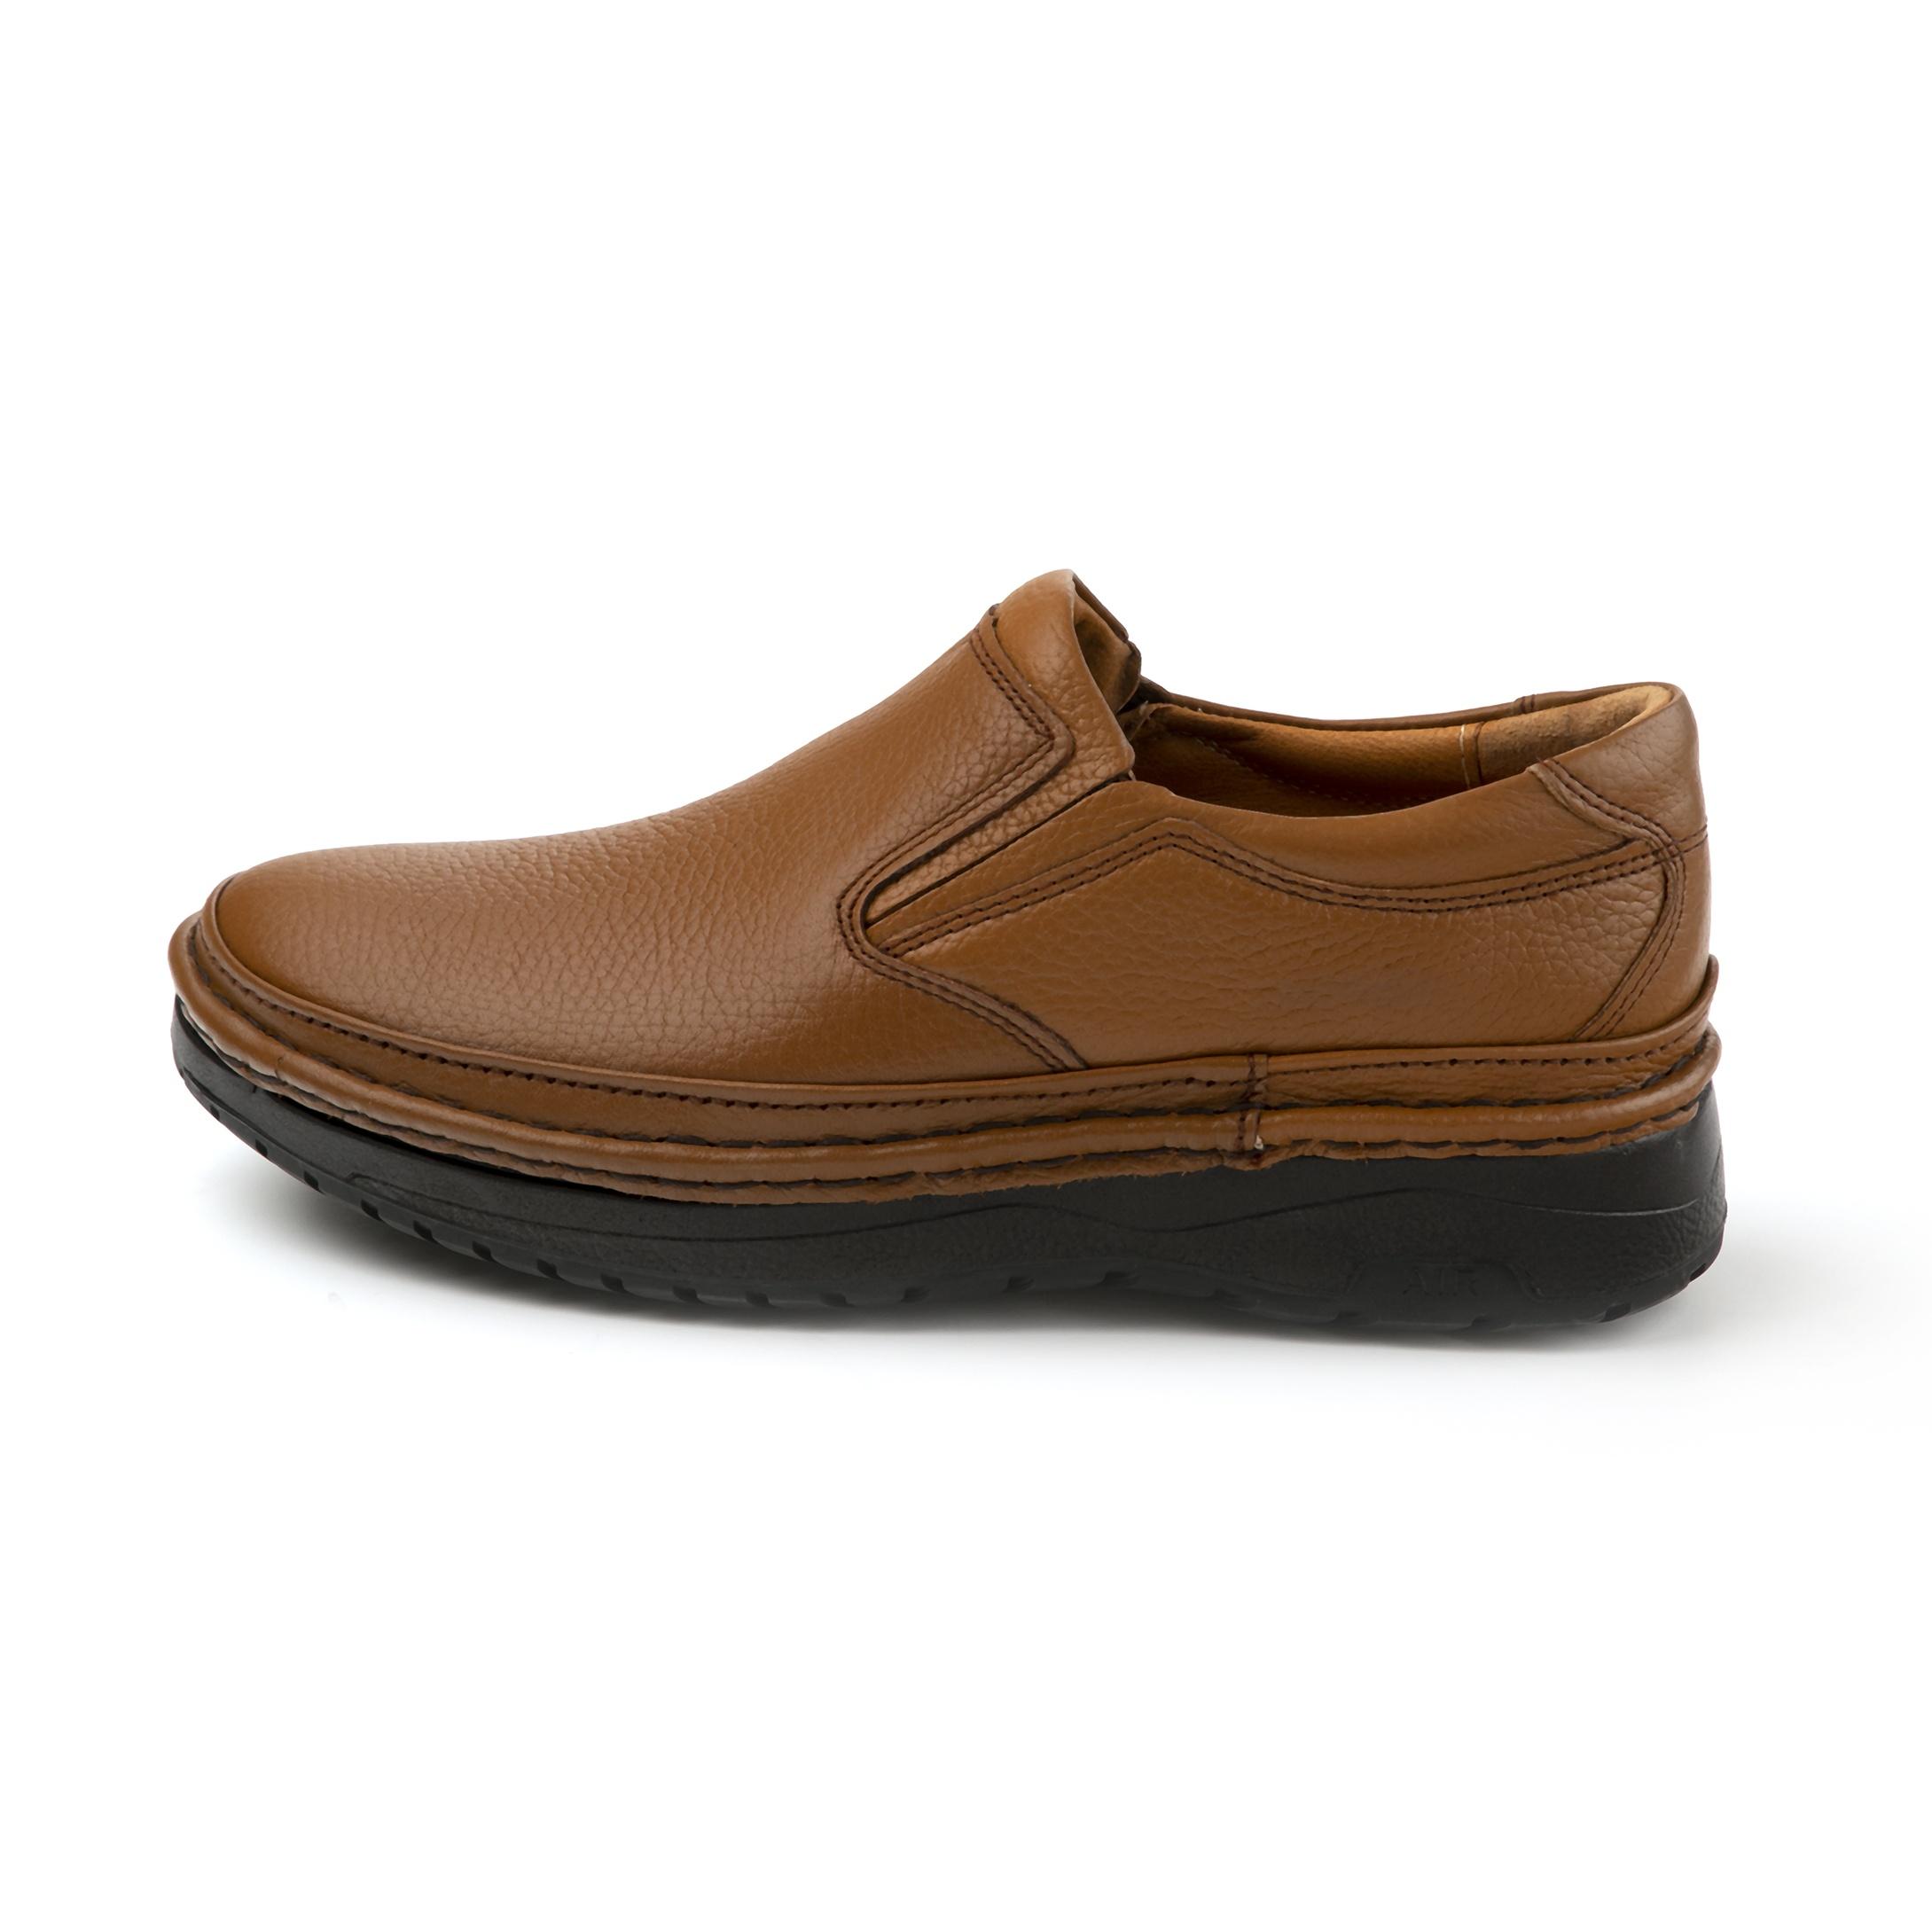 کفش روزمره مردانه شیفر مدل 7313A503136